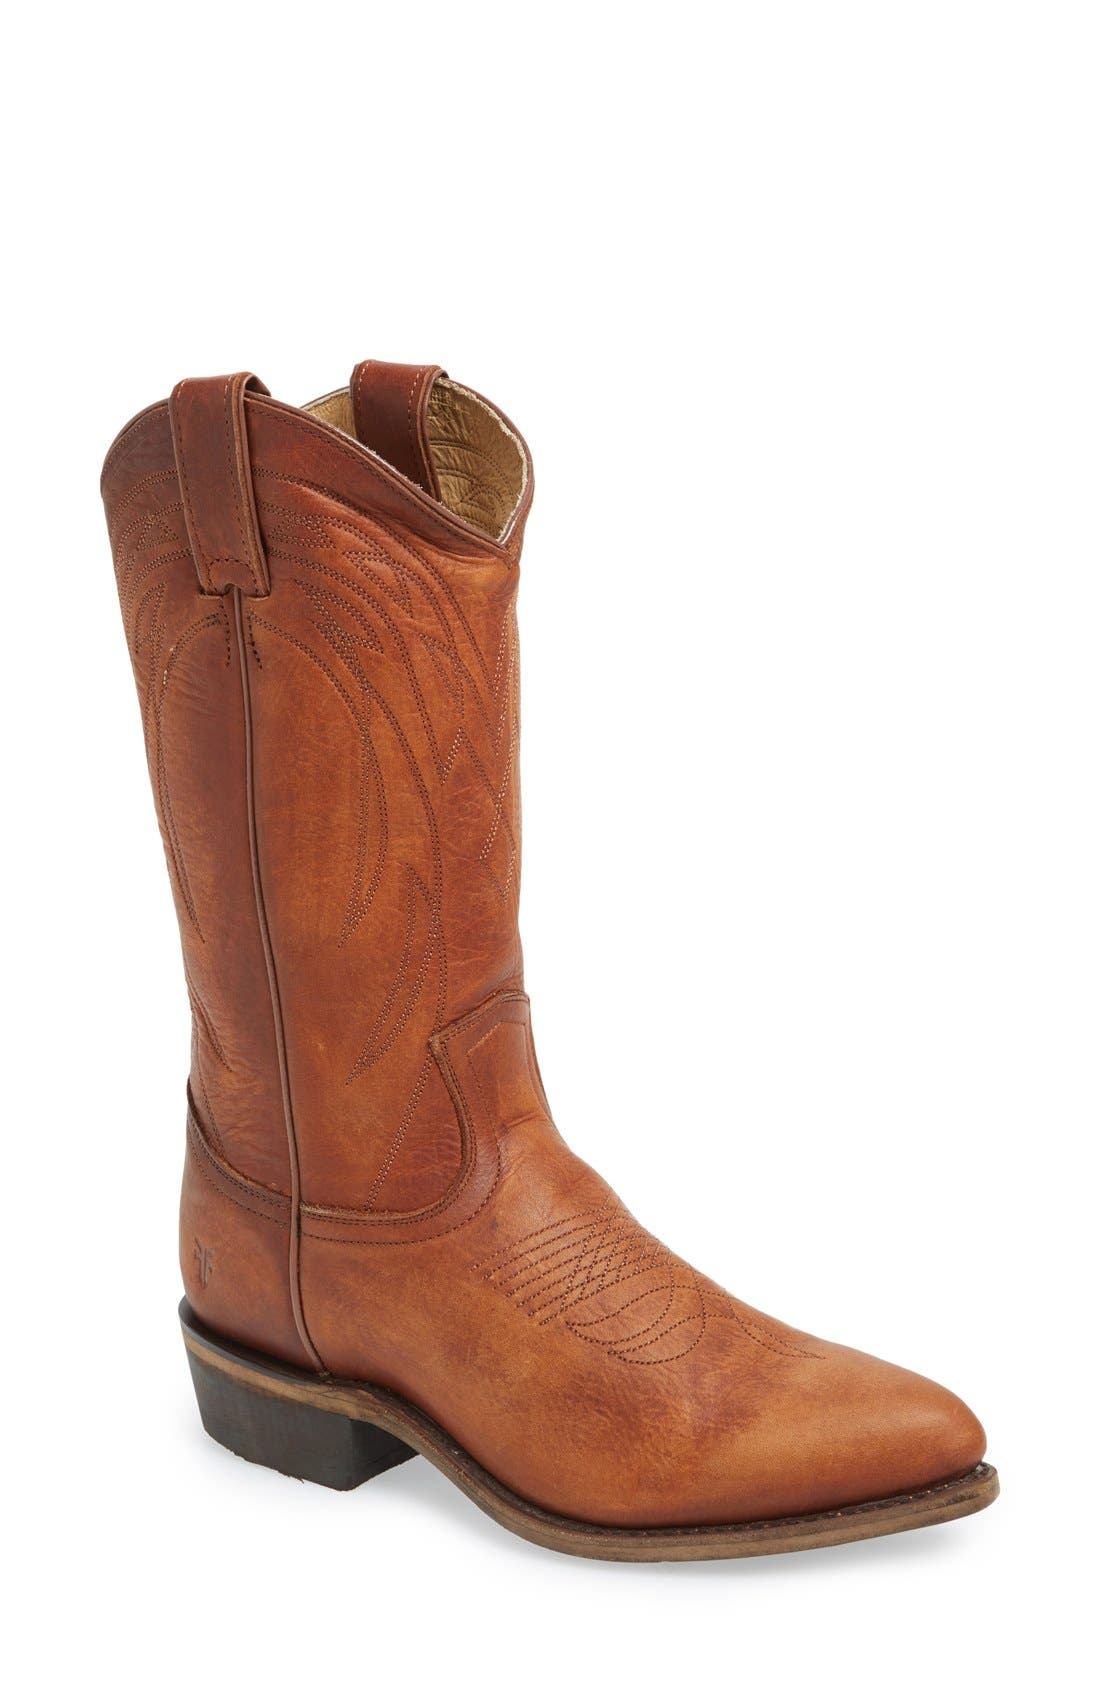 Alternate Image 1 Selected - Frye 'Billy' Western Boot (Women)